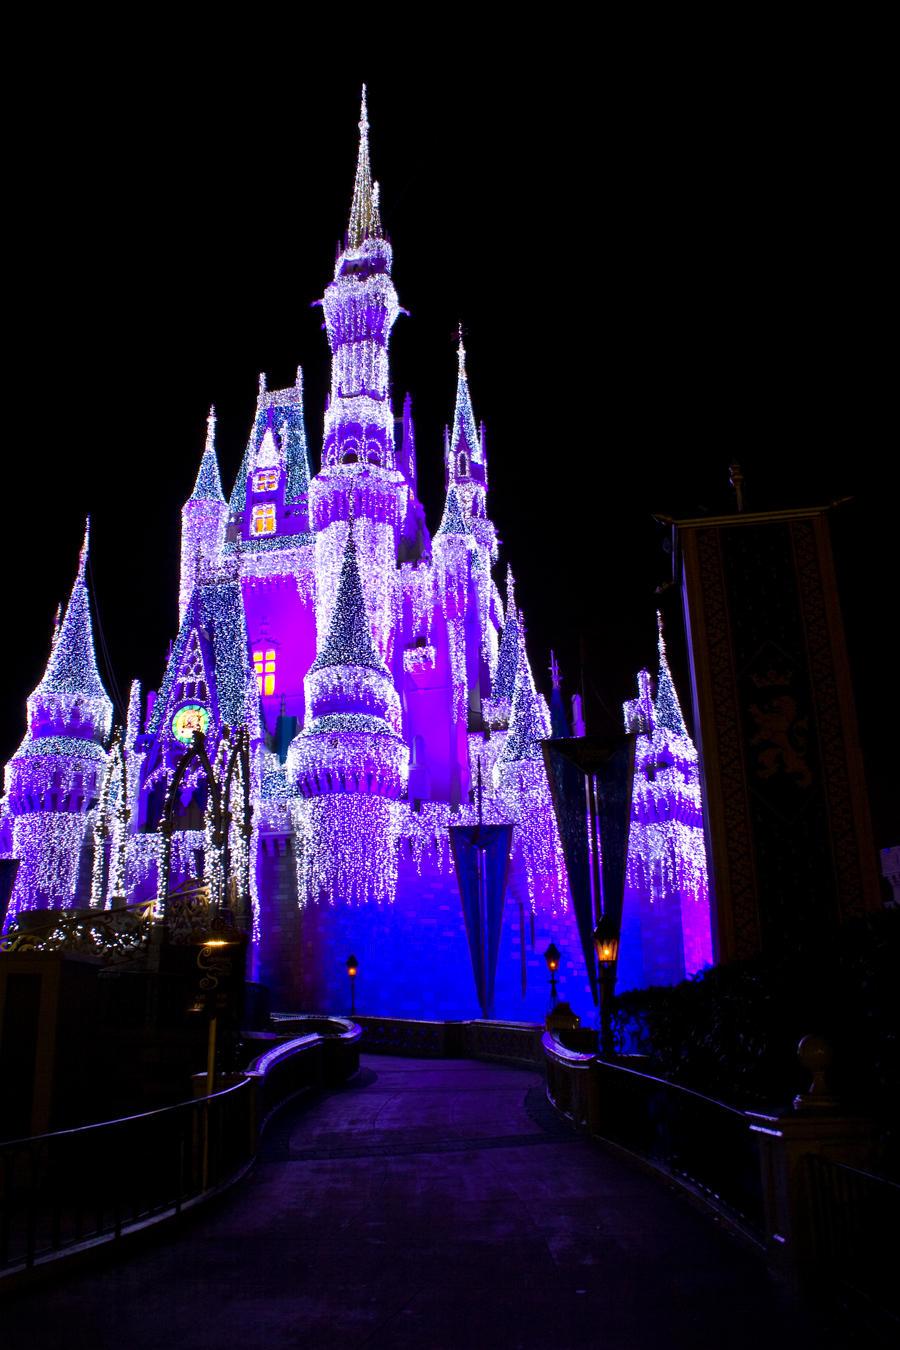 ... .com/toys-games/pr/walt-disney-world-cinderella-castle-sculpture.html